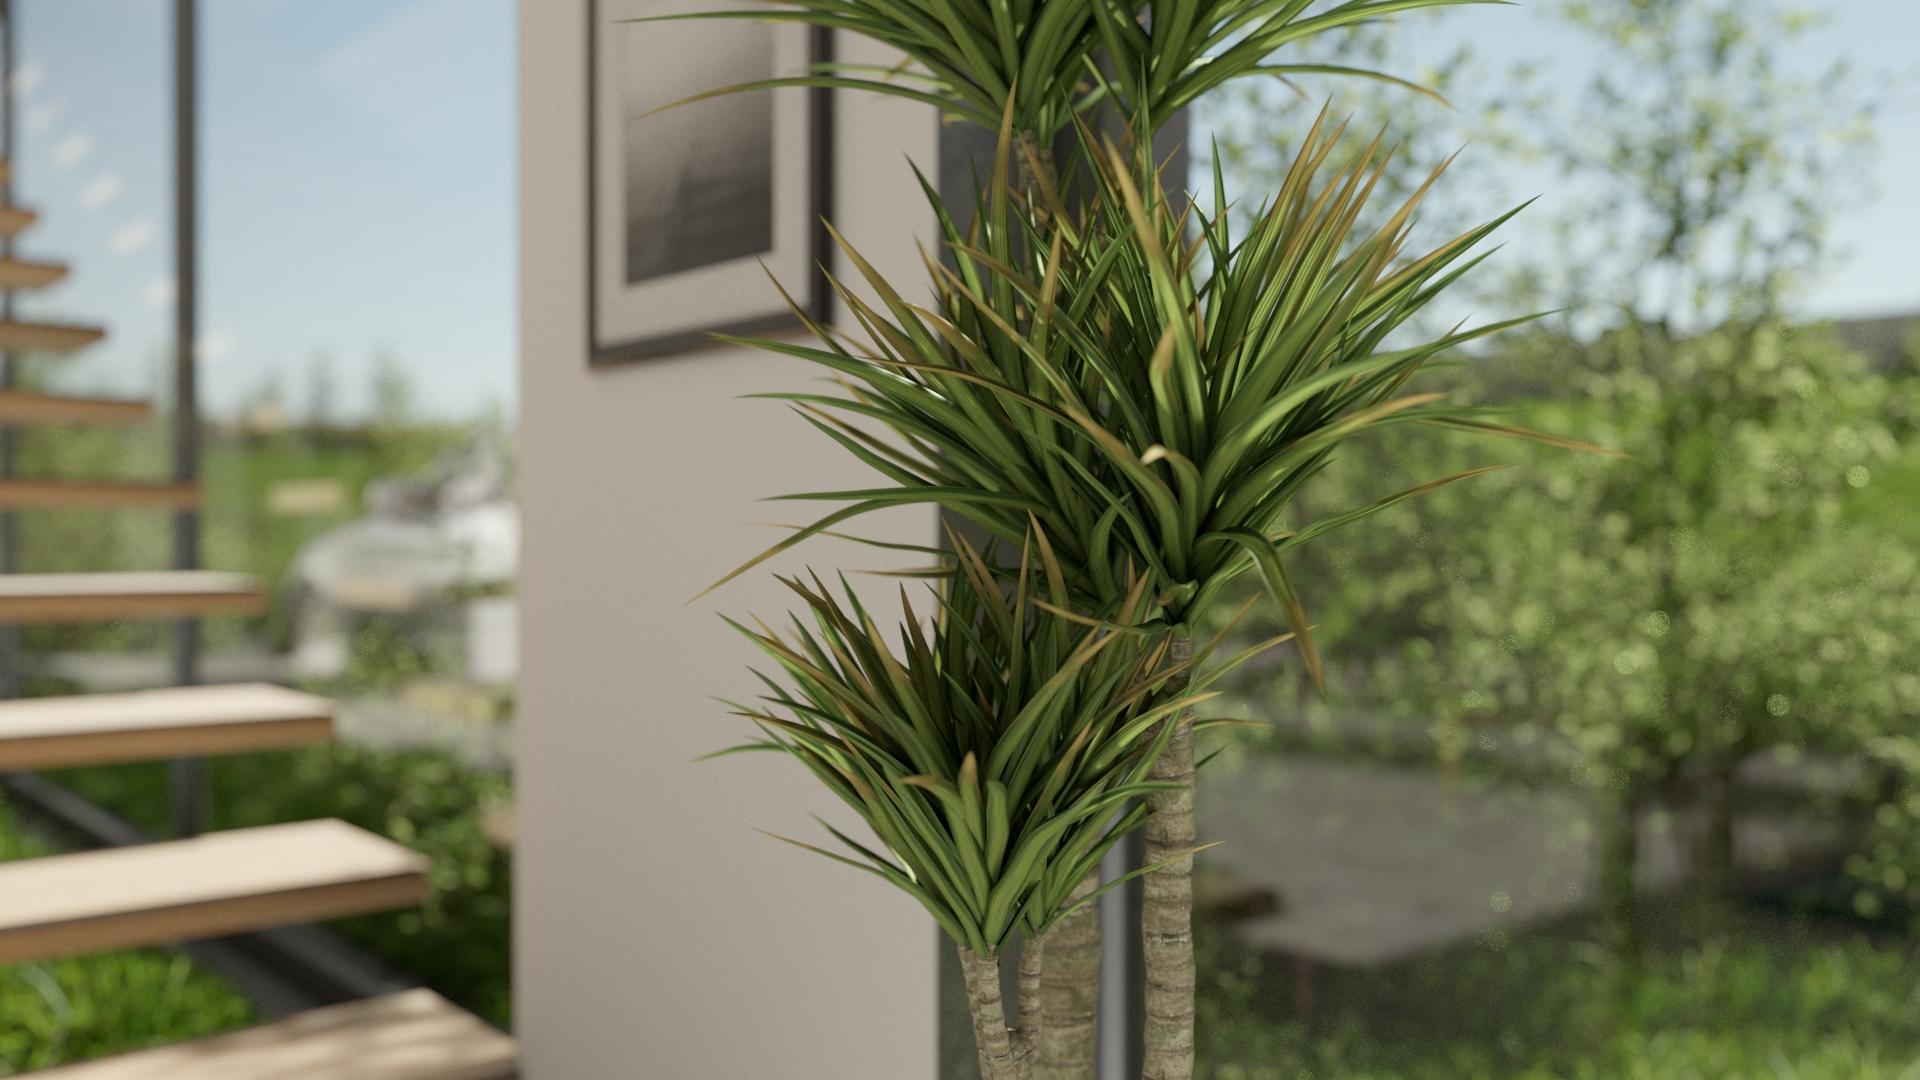 Dracaena Interior plant